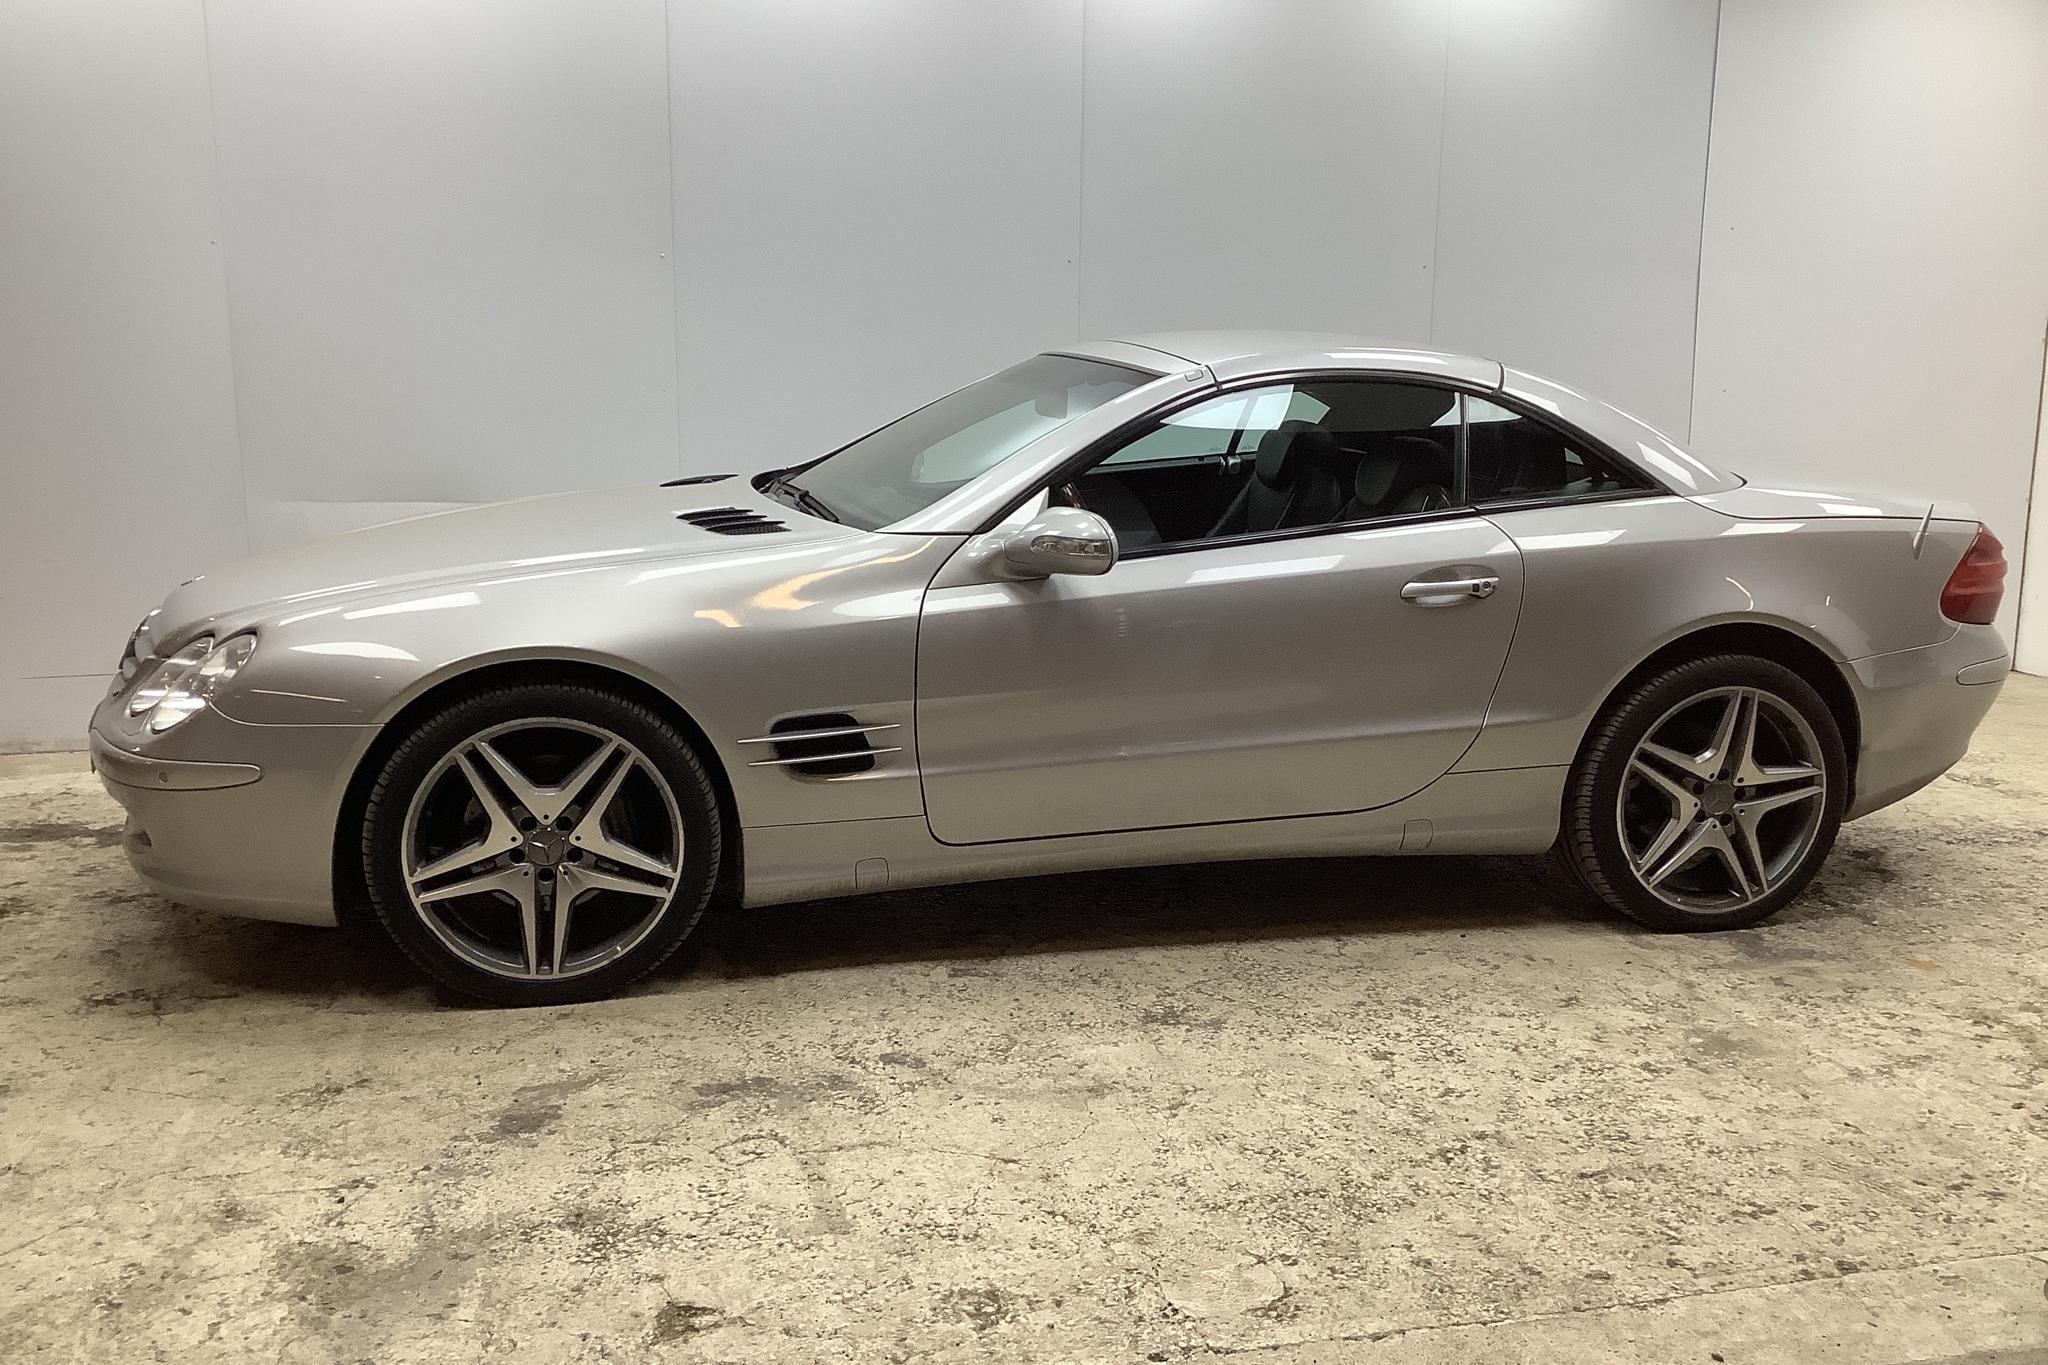 Mercedes SL 500 R230 (306hk) - 124 910 km - Automatic - silver - 2002